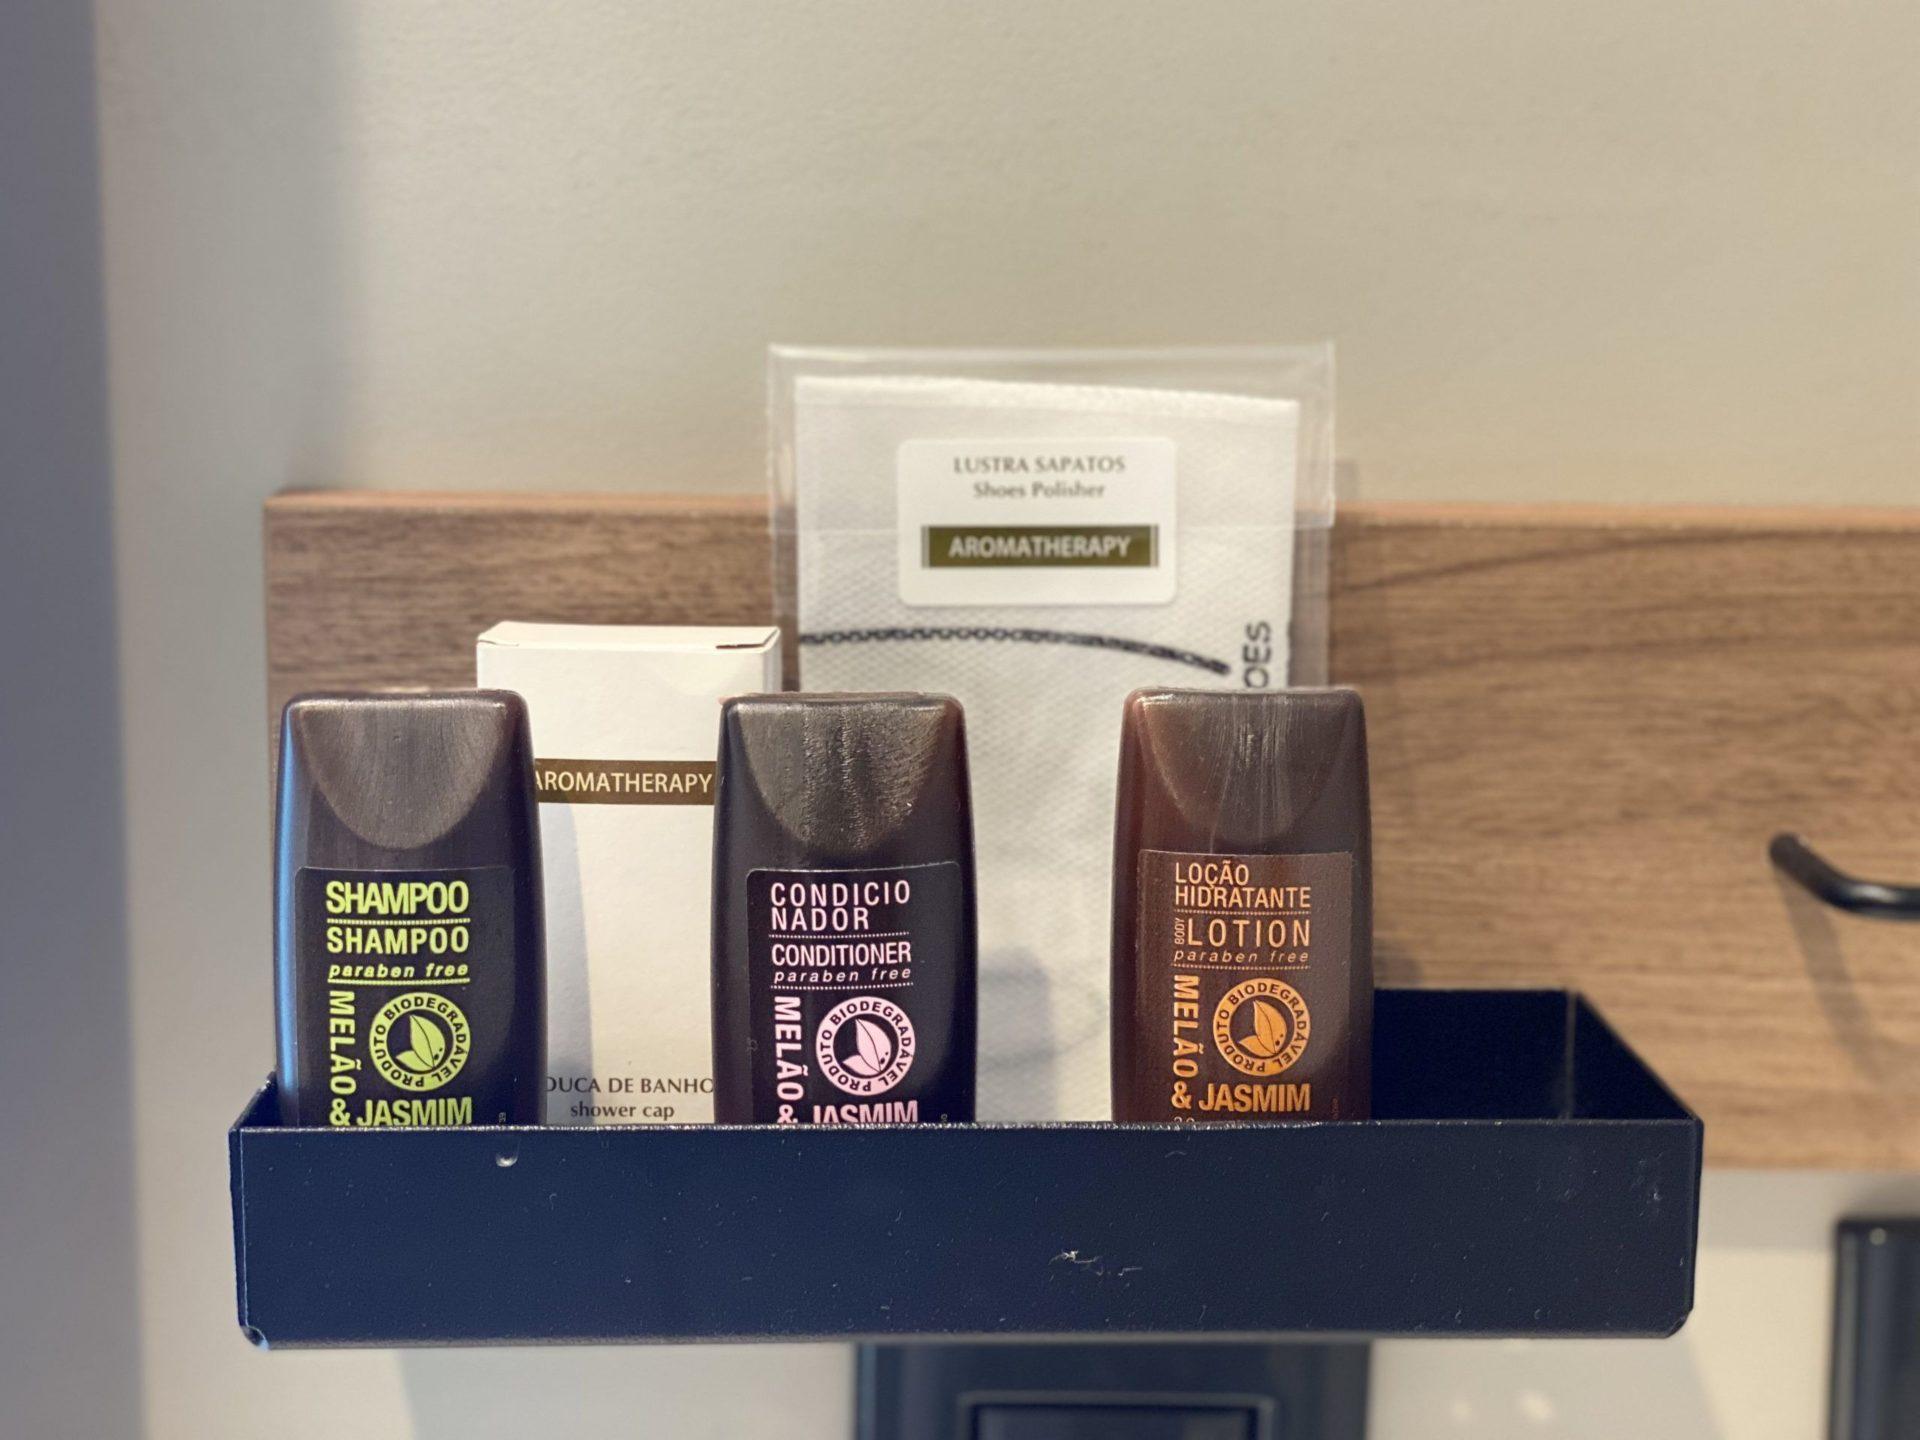 Grand Mercure sp Itaim Bibi amenities shampoo condicionador